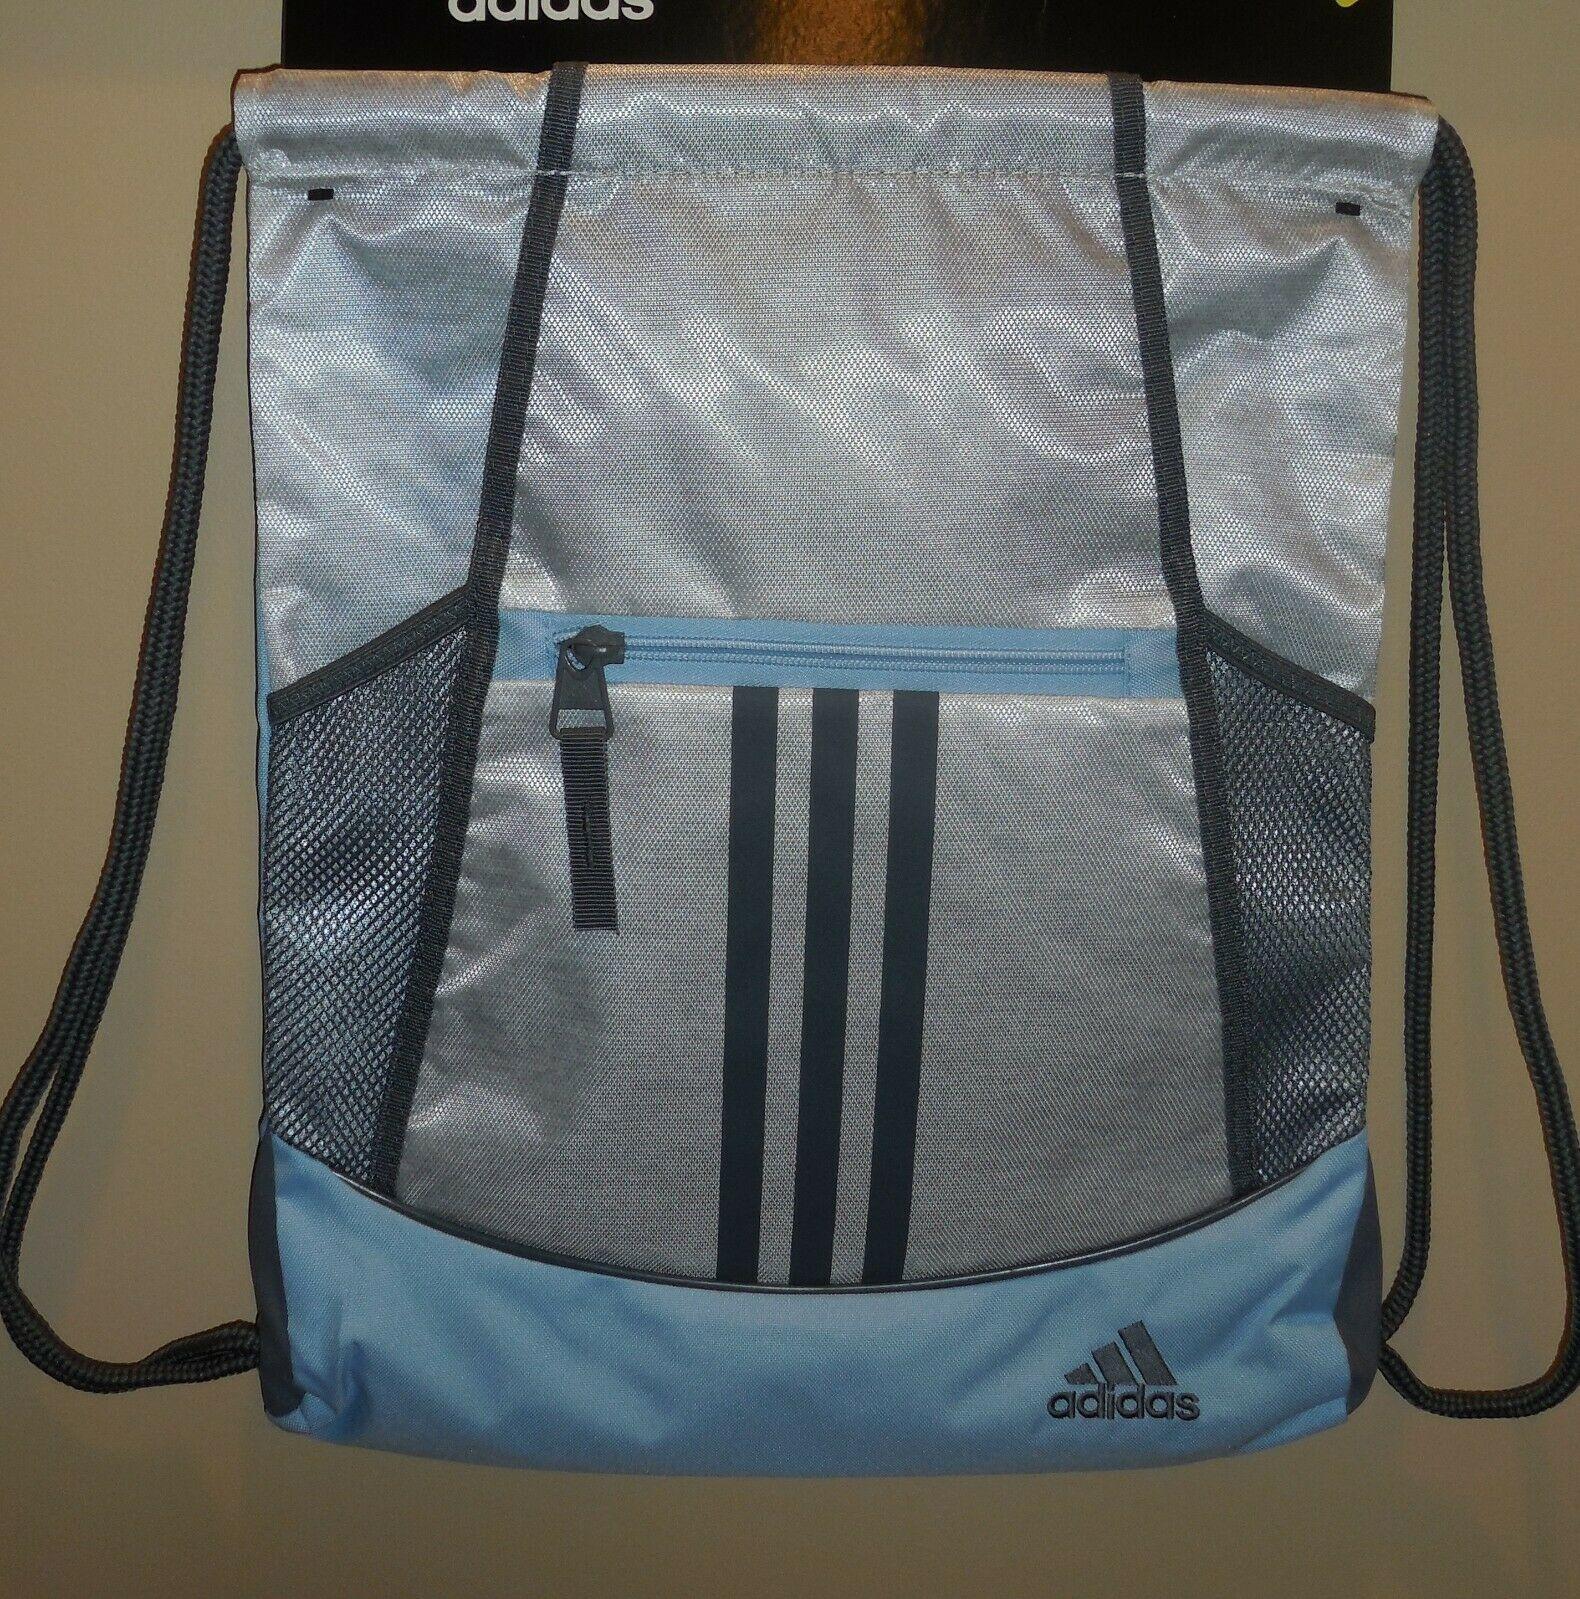 Adidas Alliance II Sackpack Drawstring Bag Grey Pink Girls 5148519 New